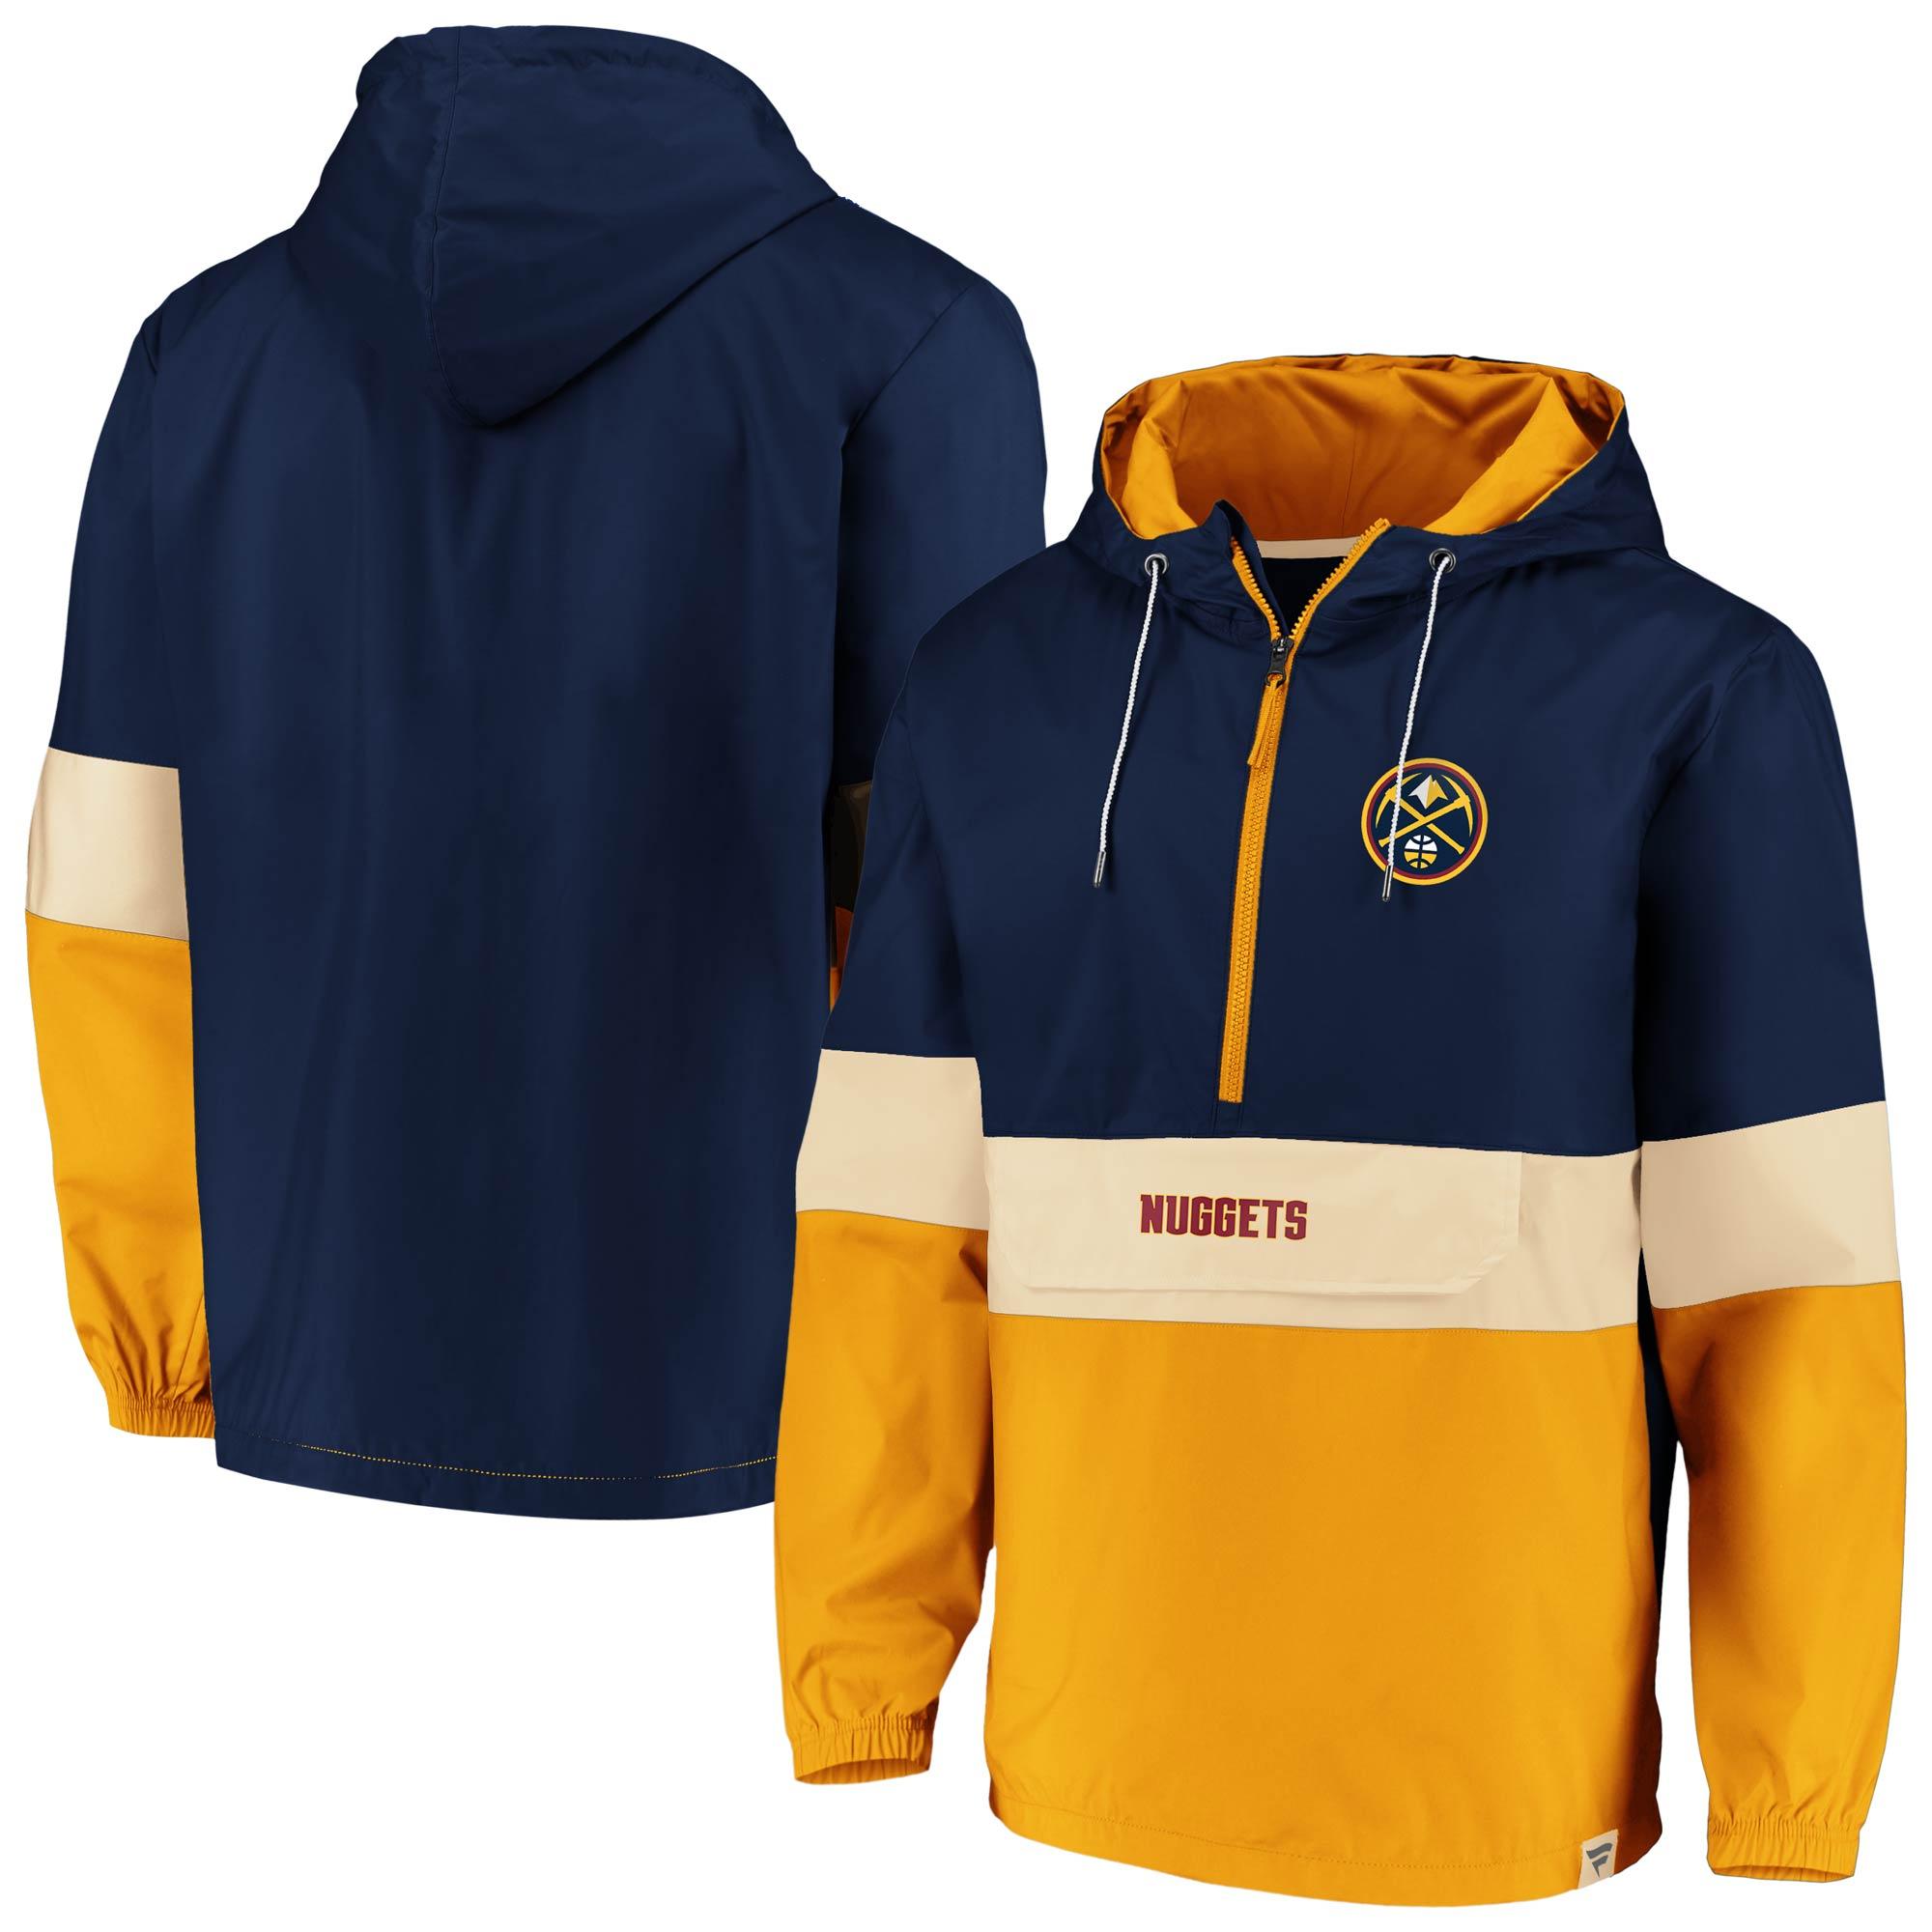 Denver Nuggets Fanatics Branded True Classics Lead Blocker Anorak Hoodie Half-Zip Windbreaker Jacket - Navy/Gold